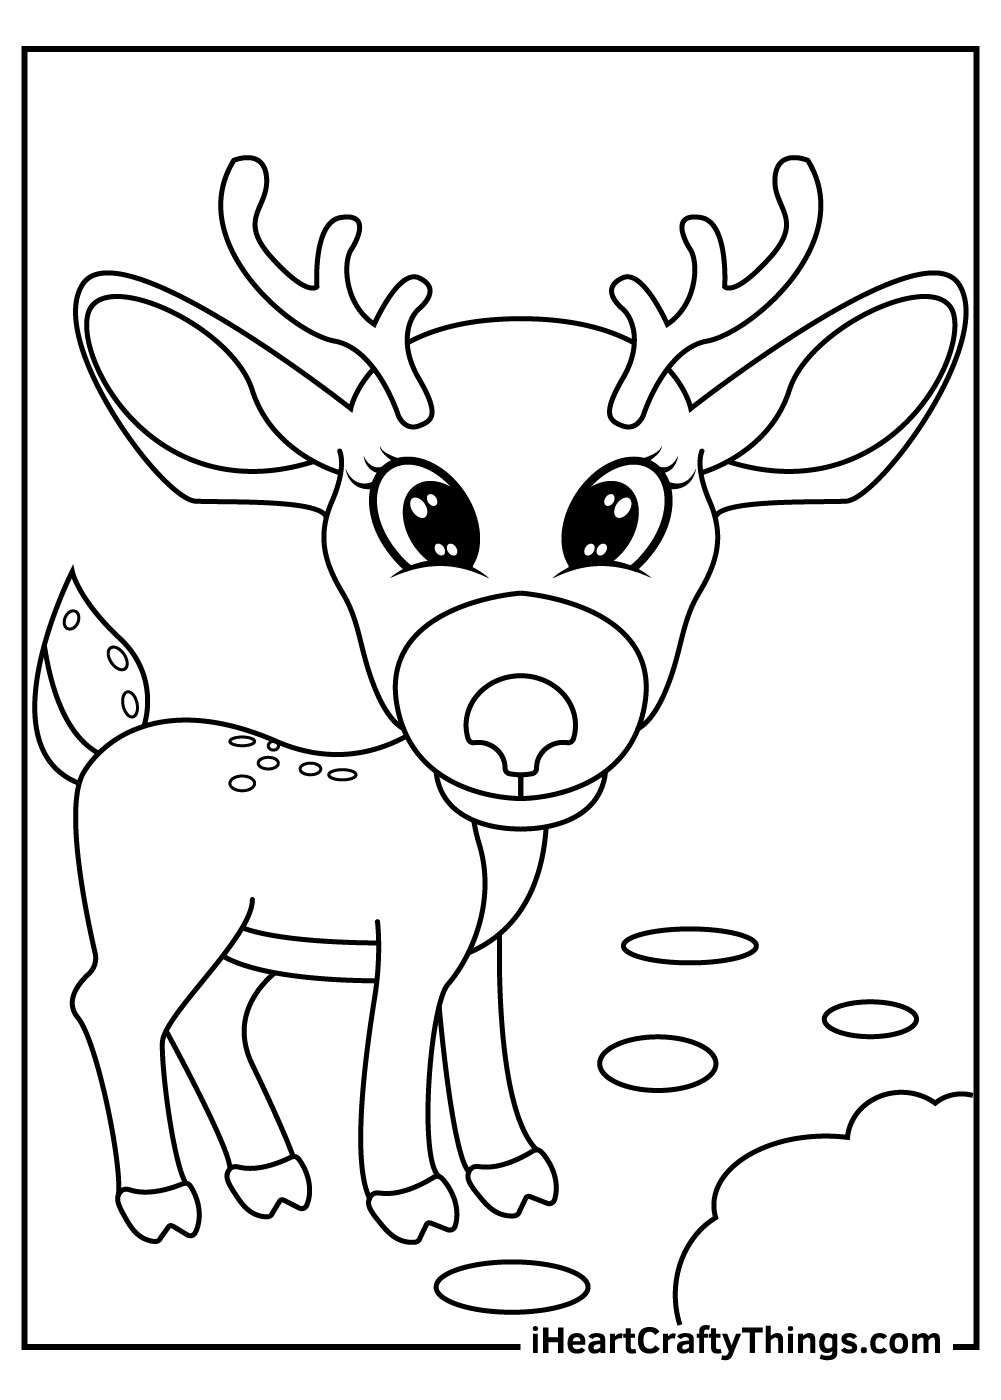 simple reindeer coloring pages free download